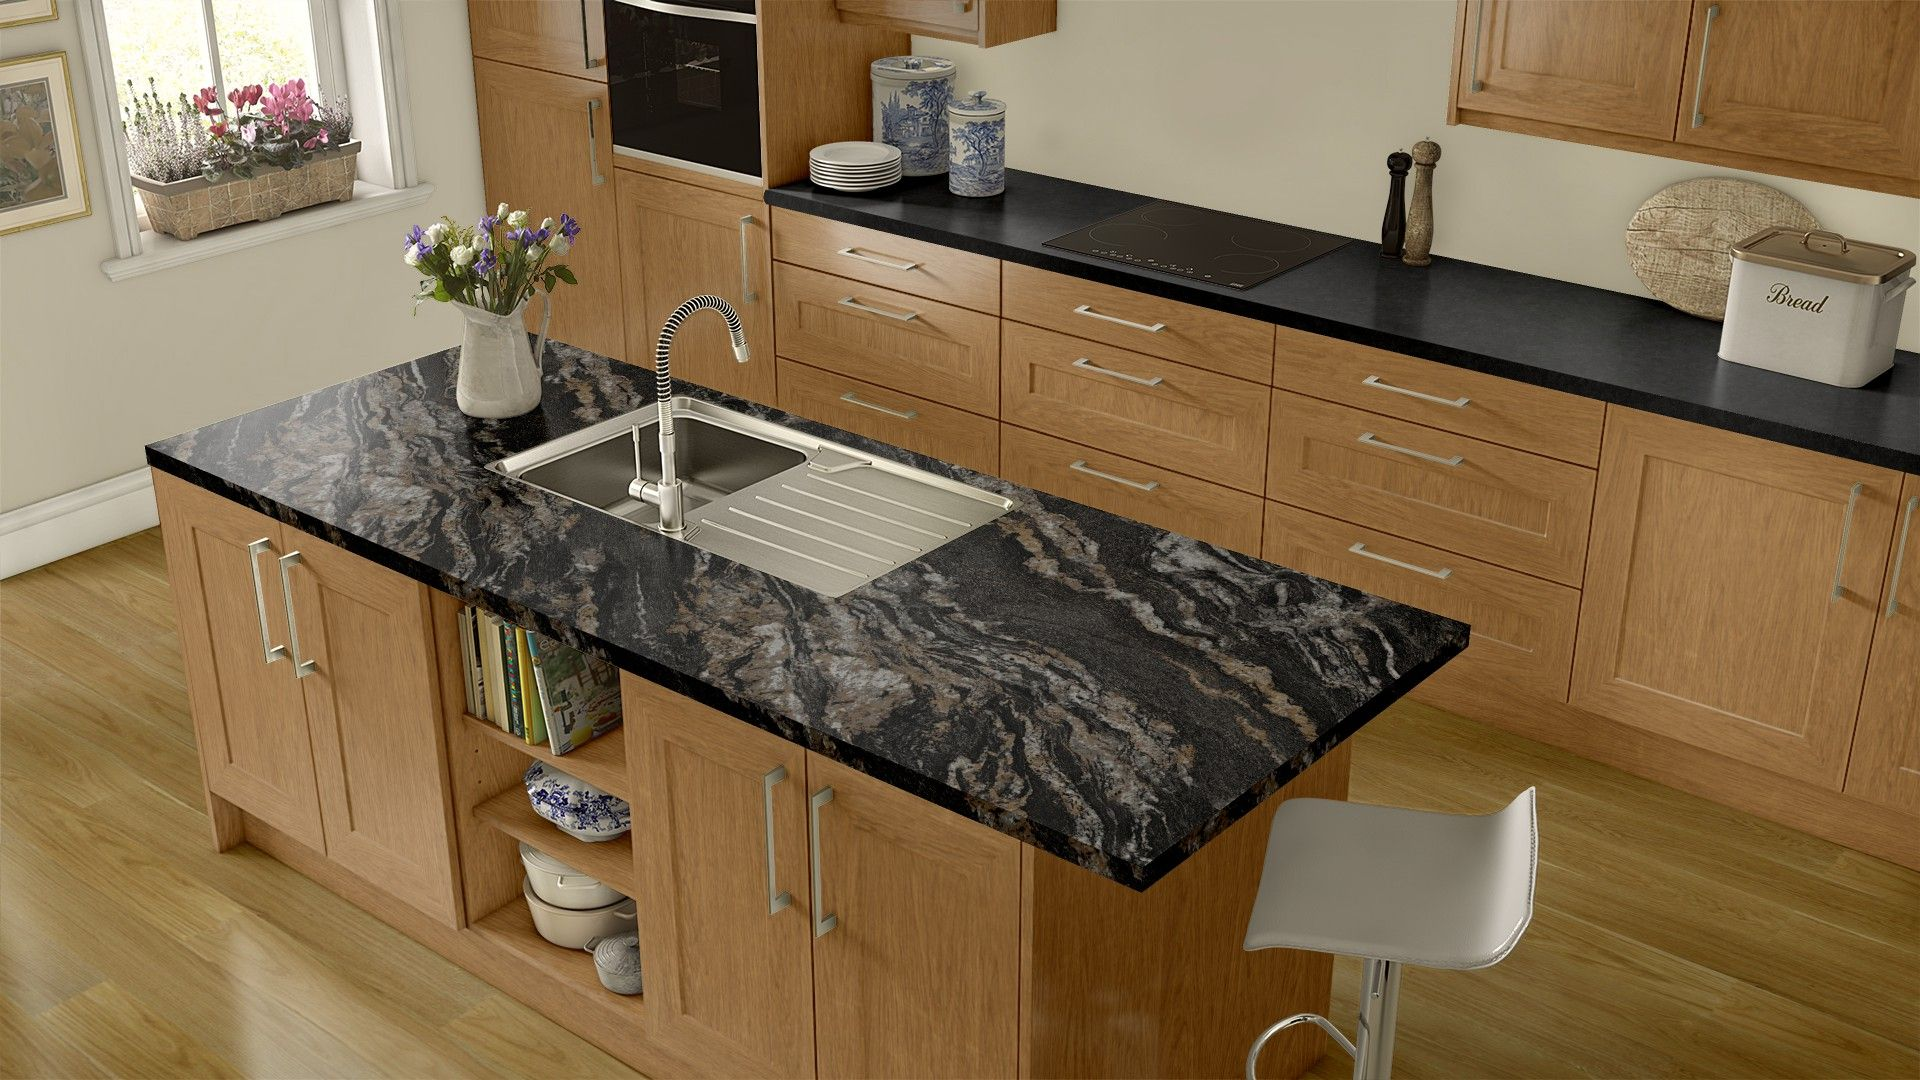 Island Magnata Countertop Luna Night Kitchen Remodel Room